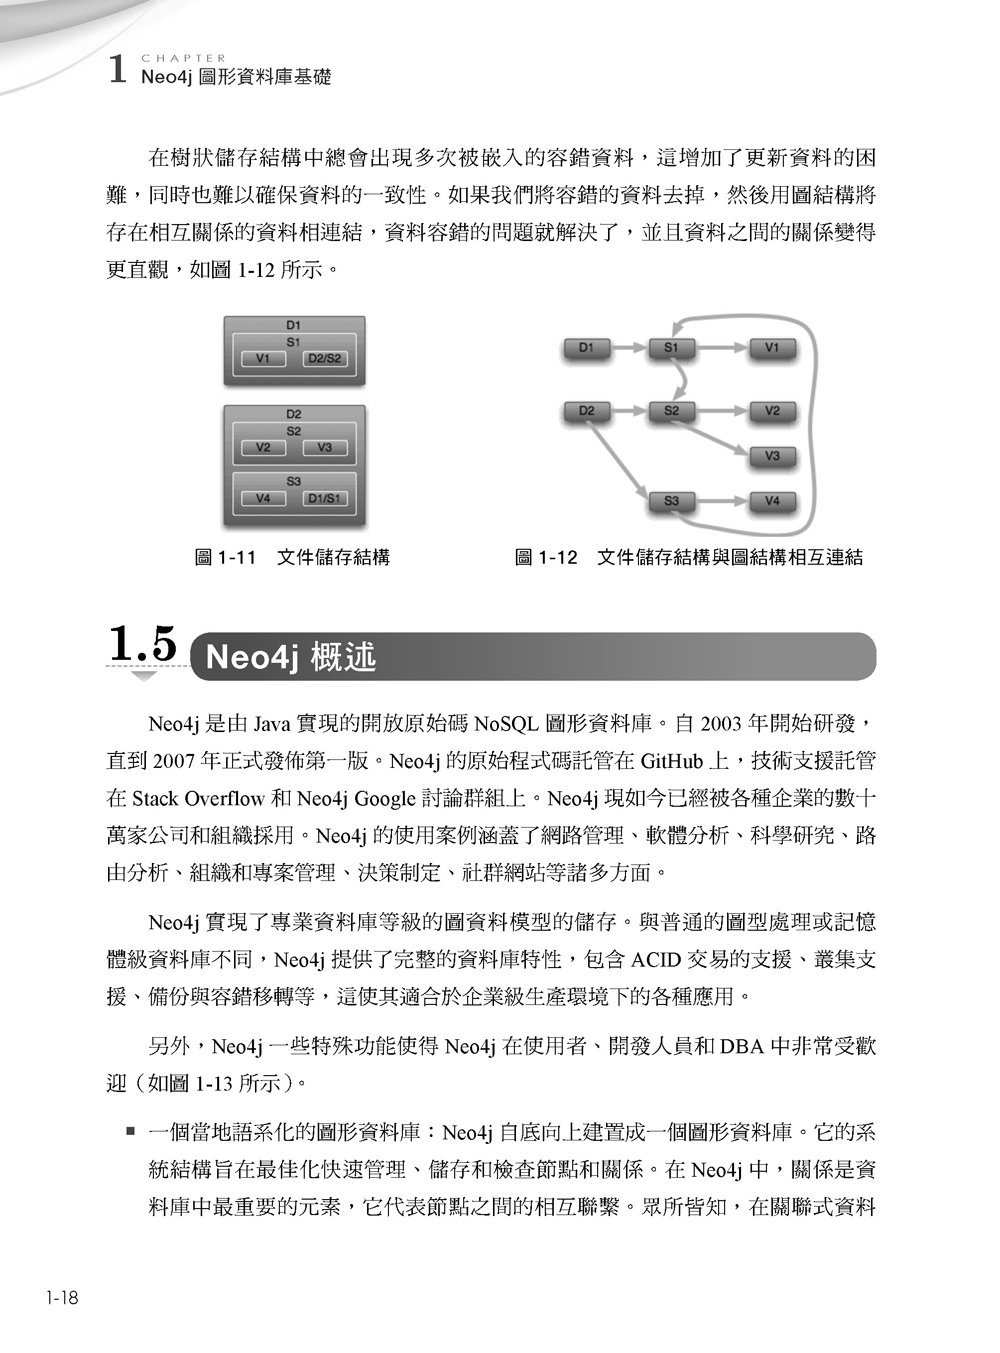 Neo4j 大事典 : 圖形資料庫 & 大數據時代-preview-9